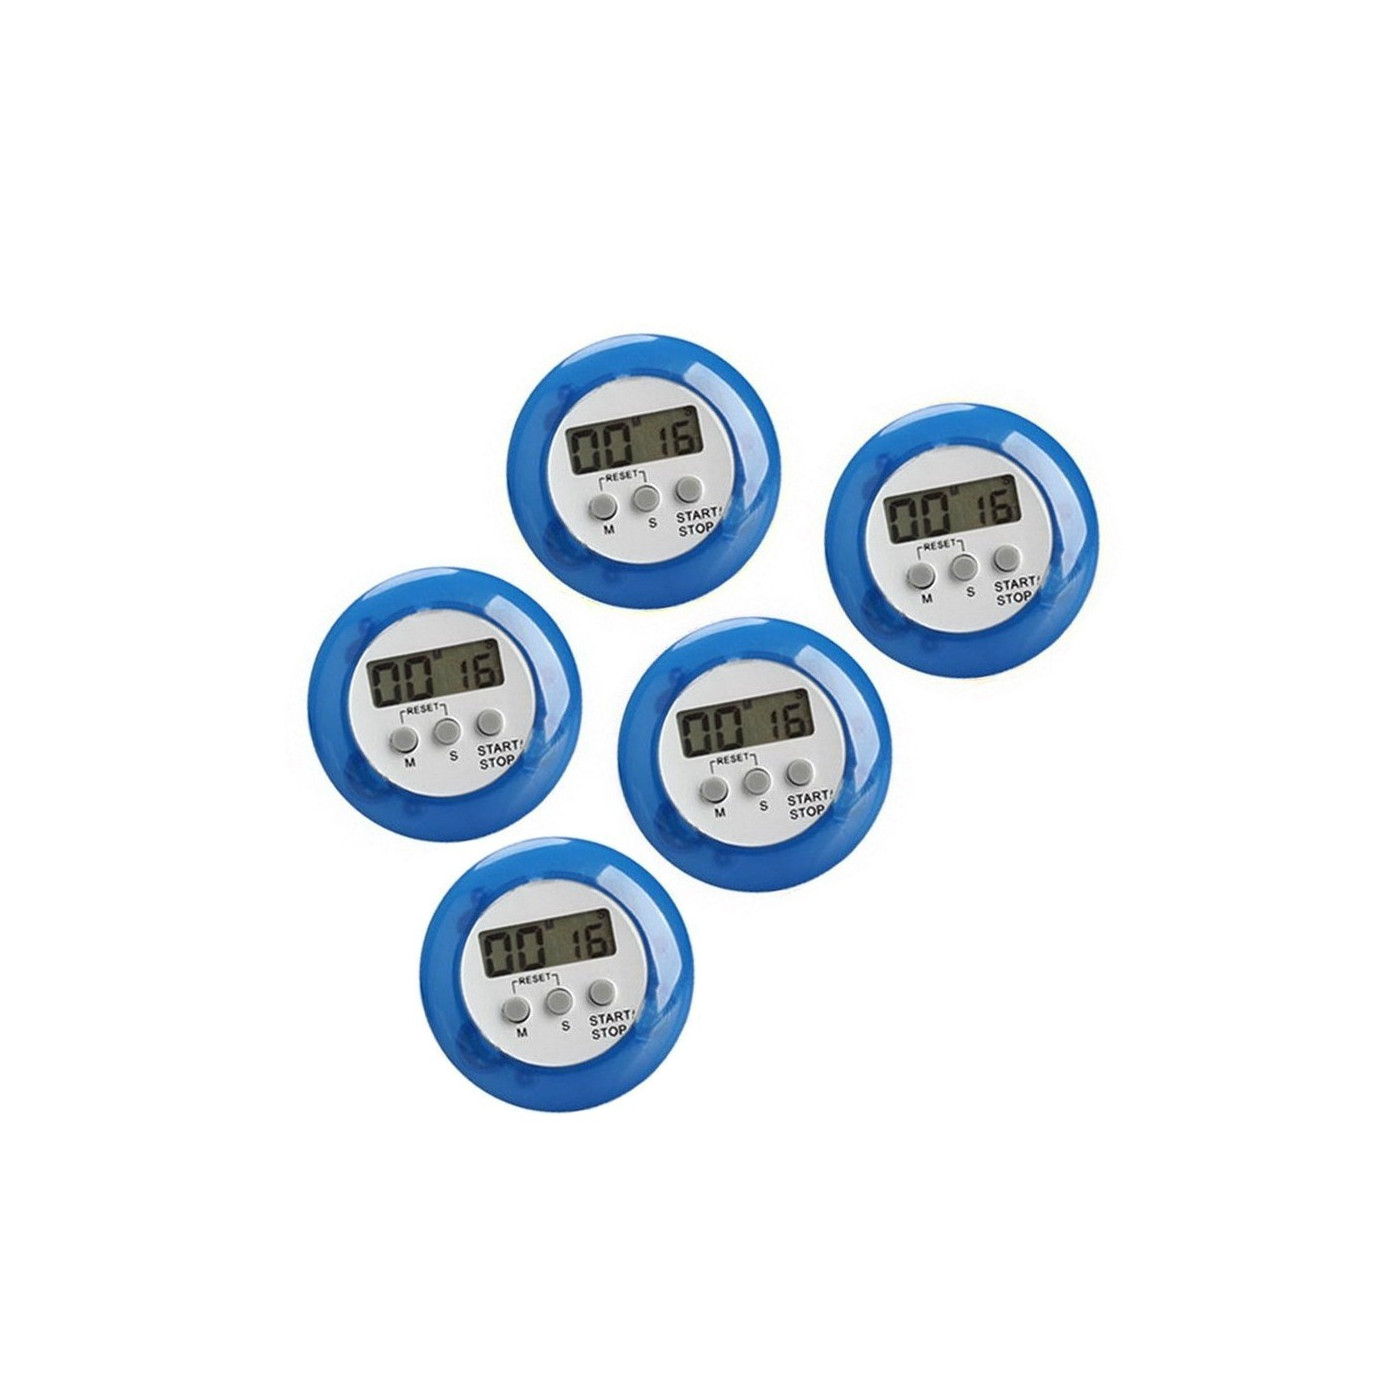 Set of 5 digital kitchen timers, alarm clocks, blue